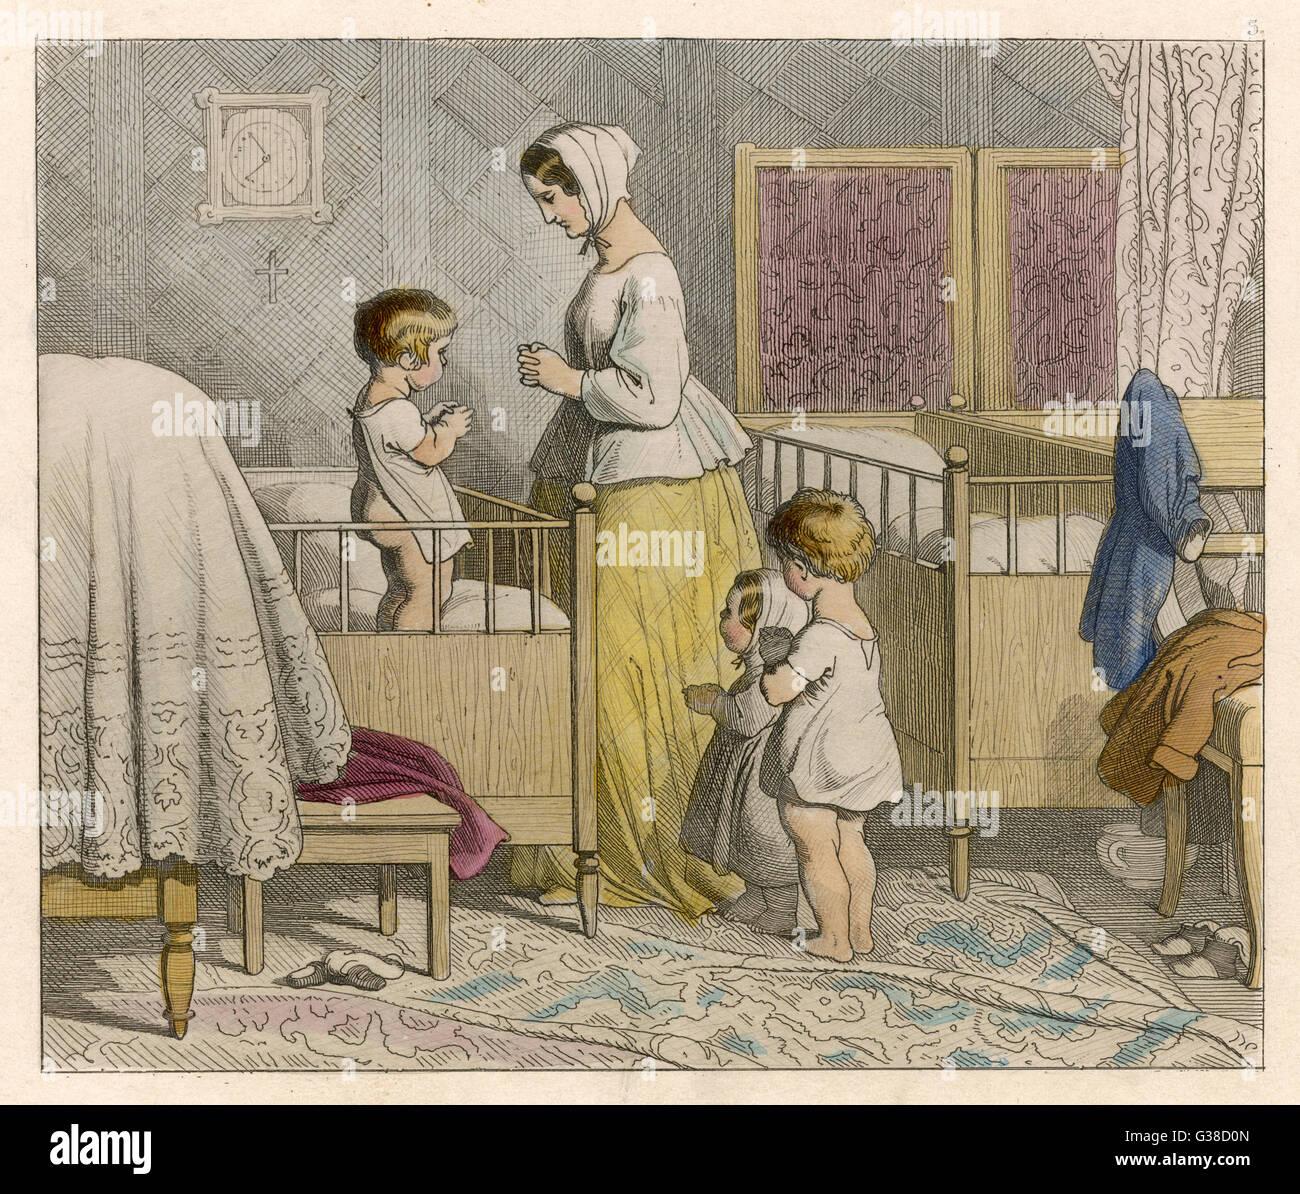 'BABY'S PRAYERS'         Date: 1852 - Stock Image